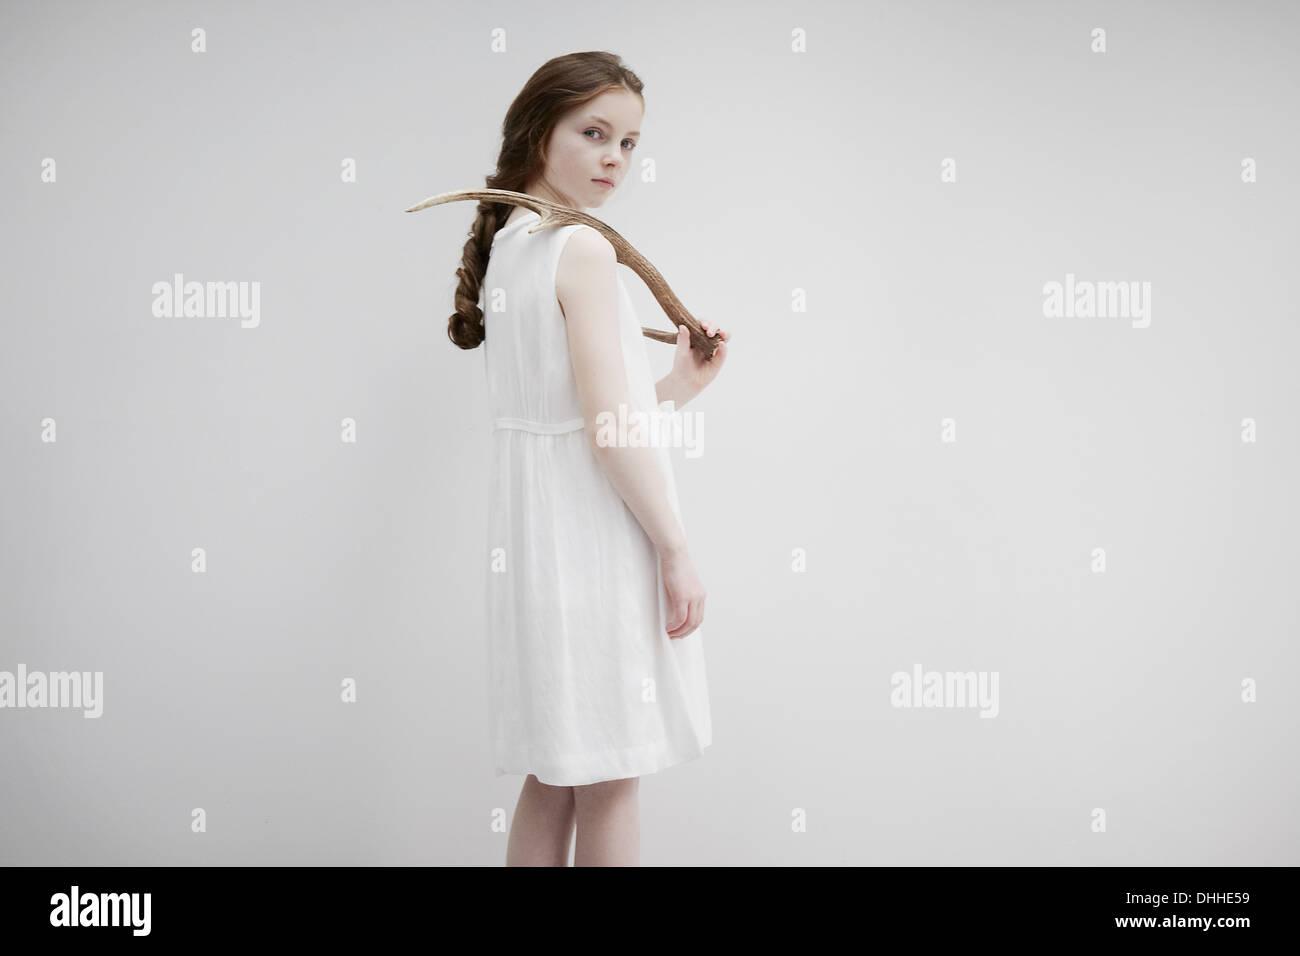 Chica posando lateralmente con cuernos Imagen De Stock